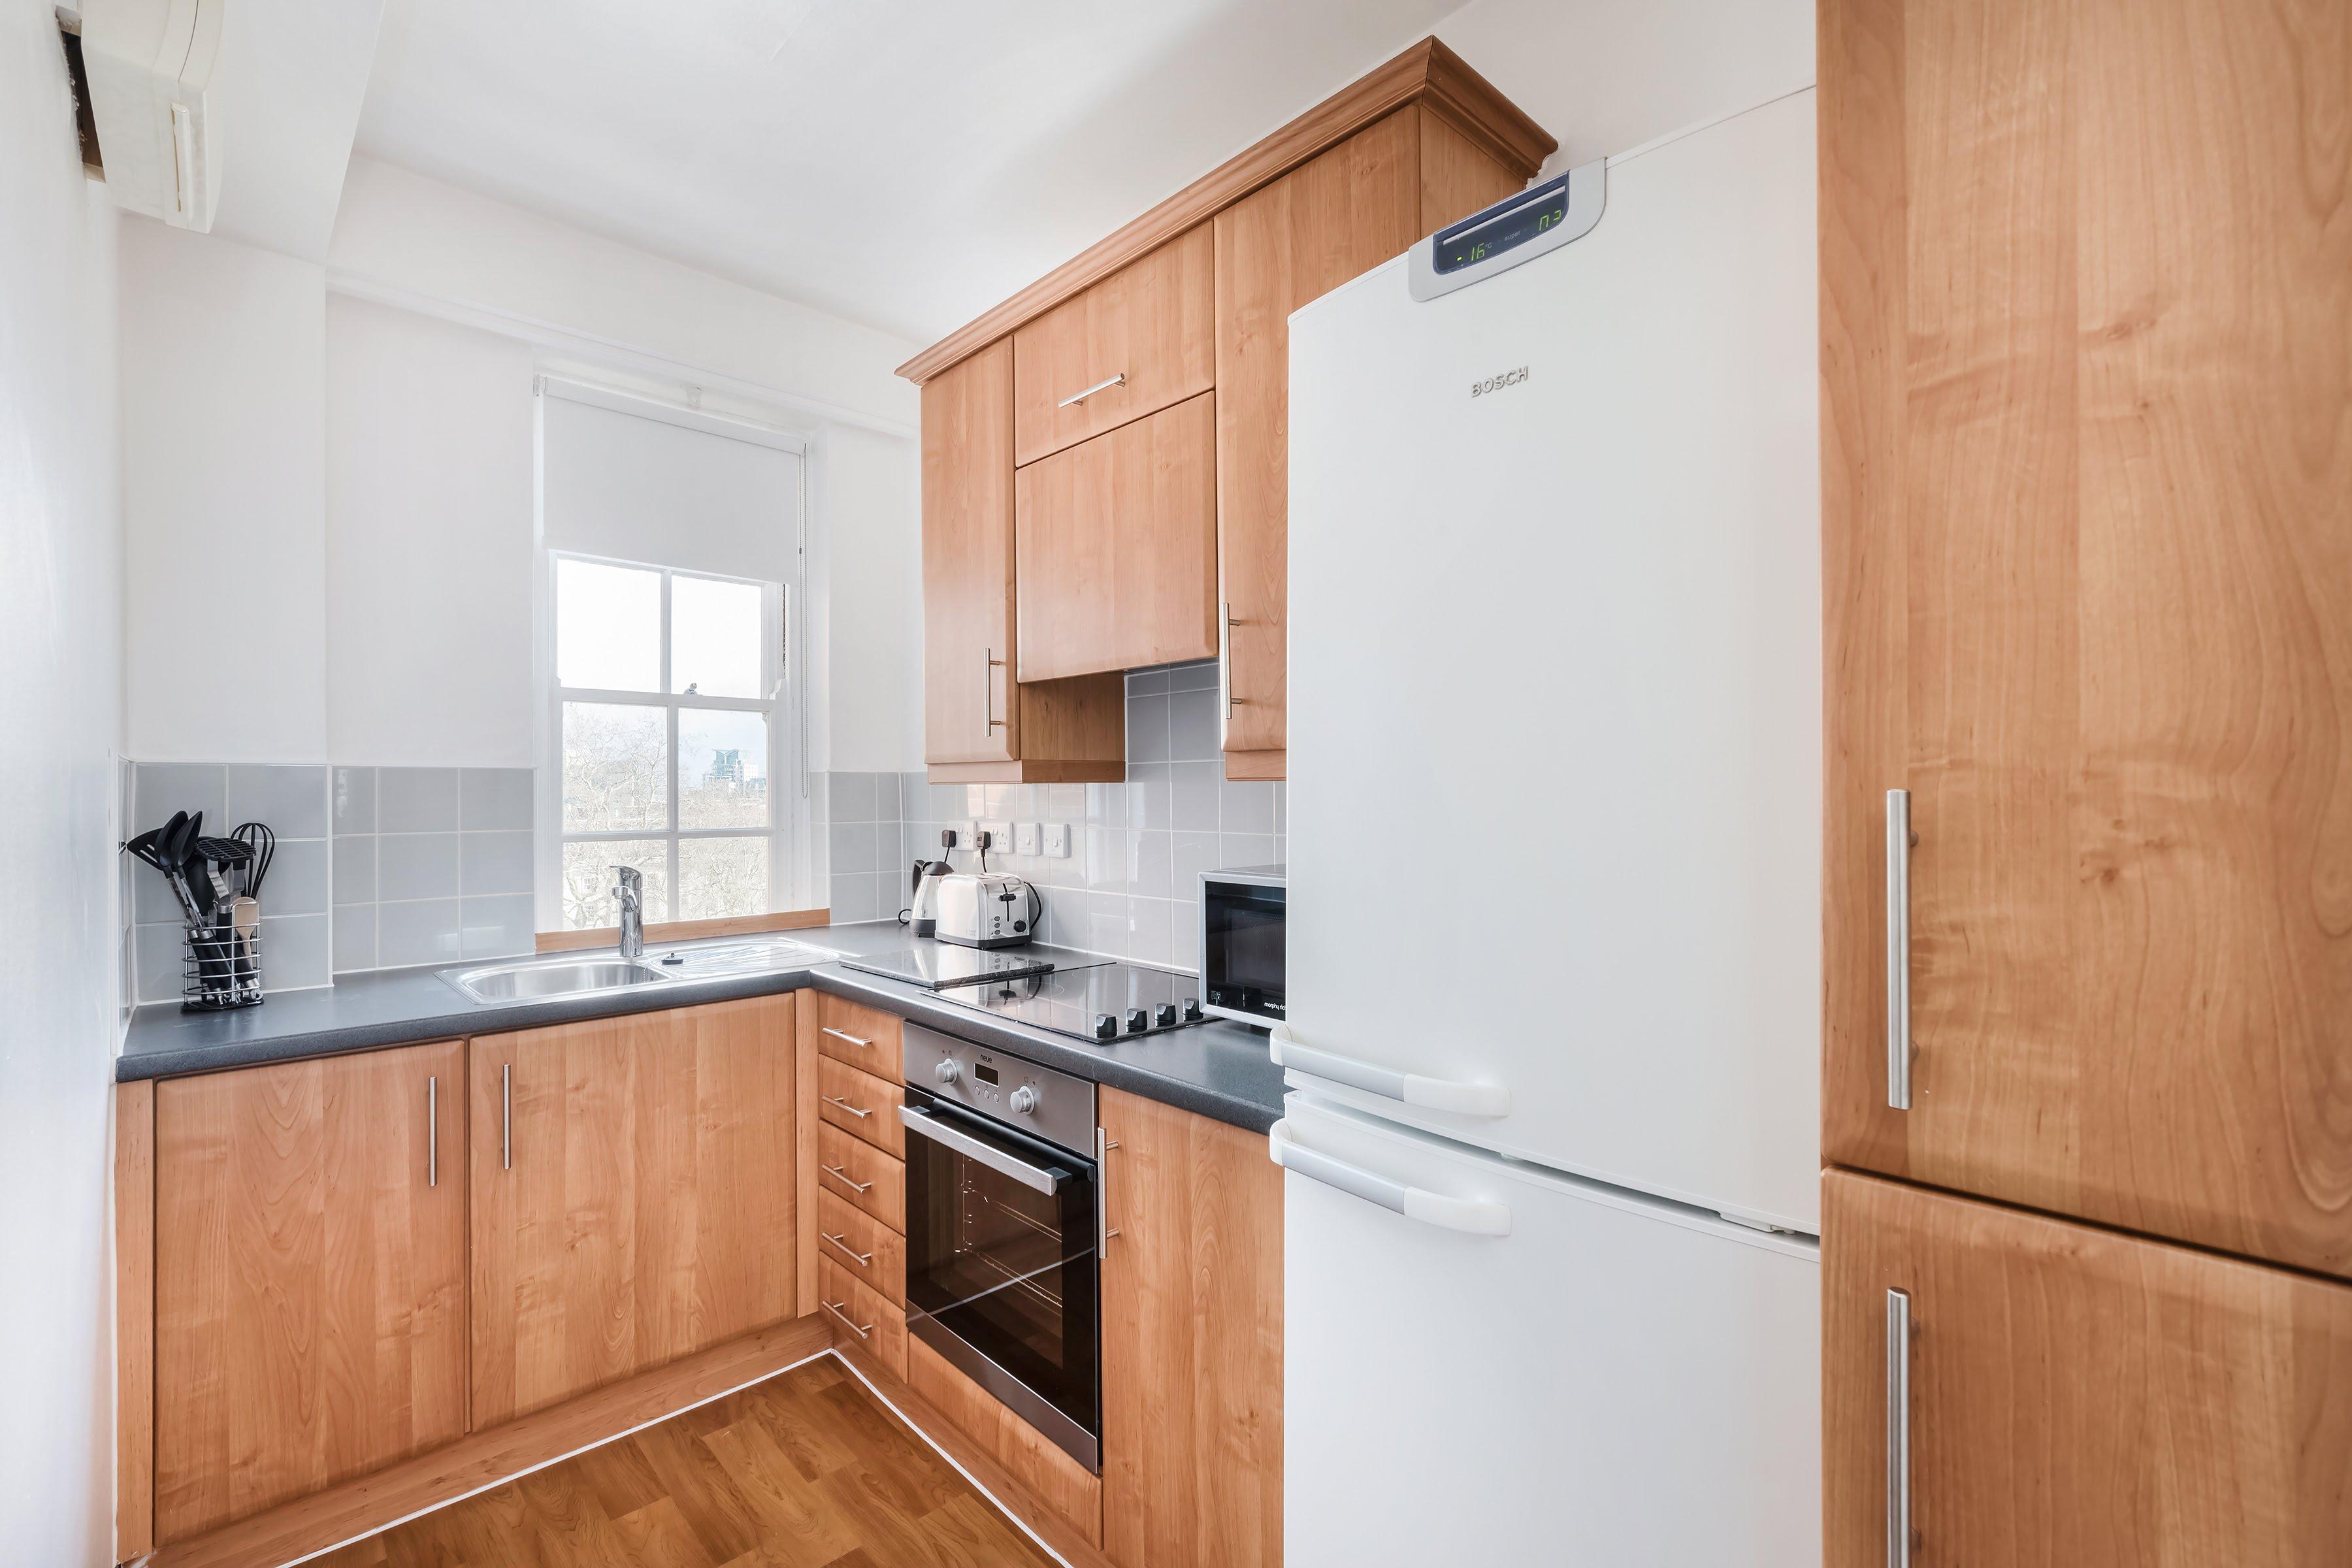 Pantry style kitchen